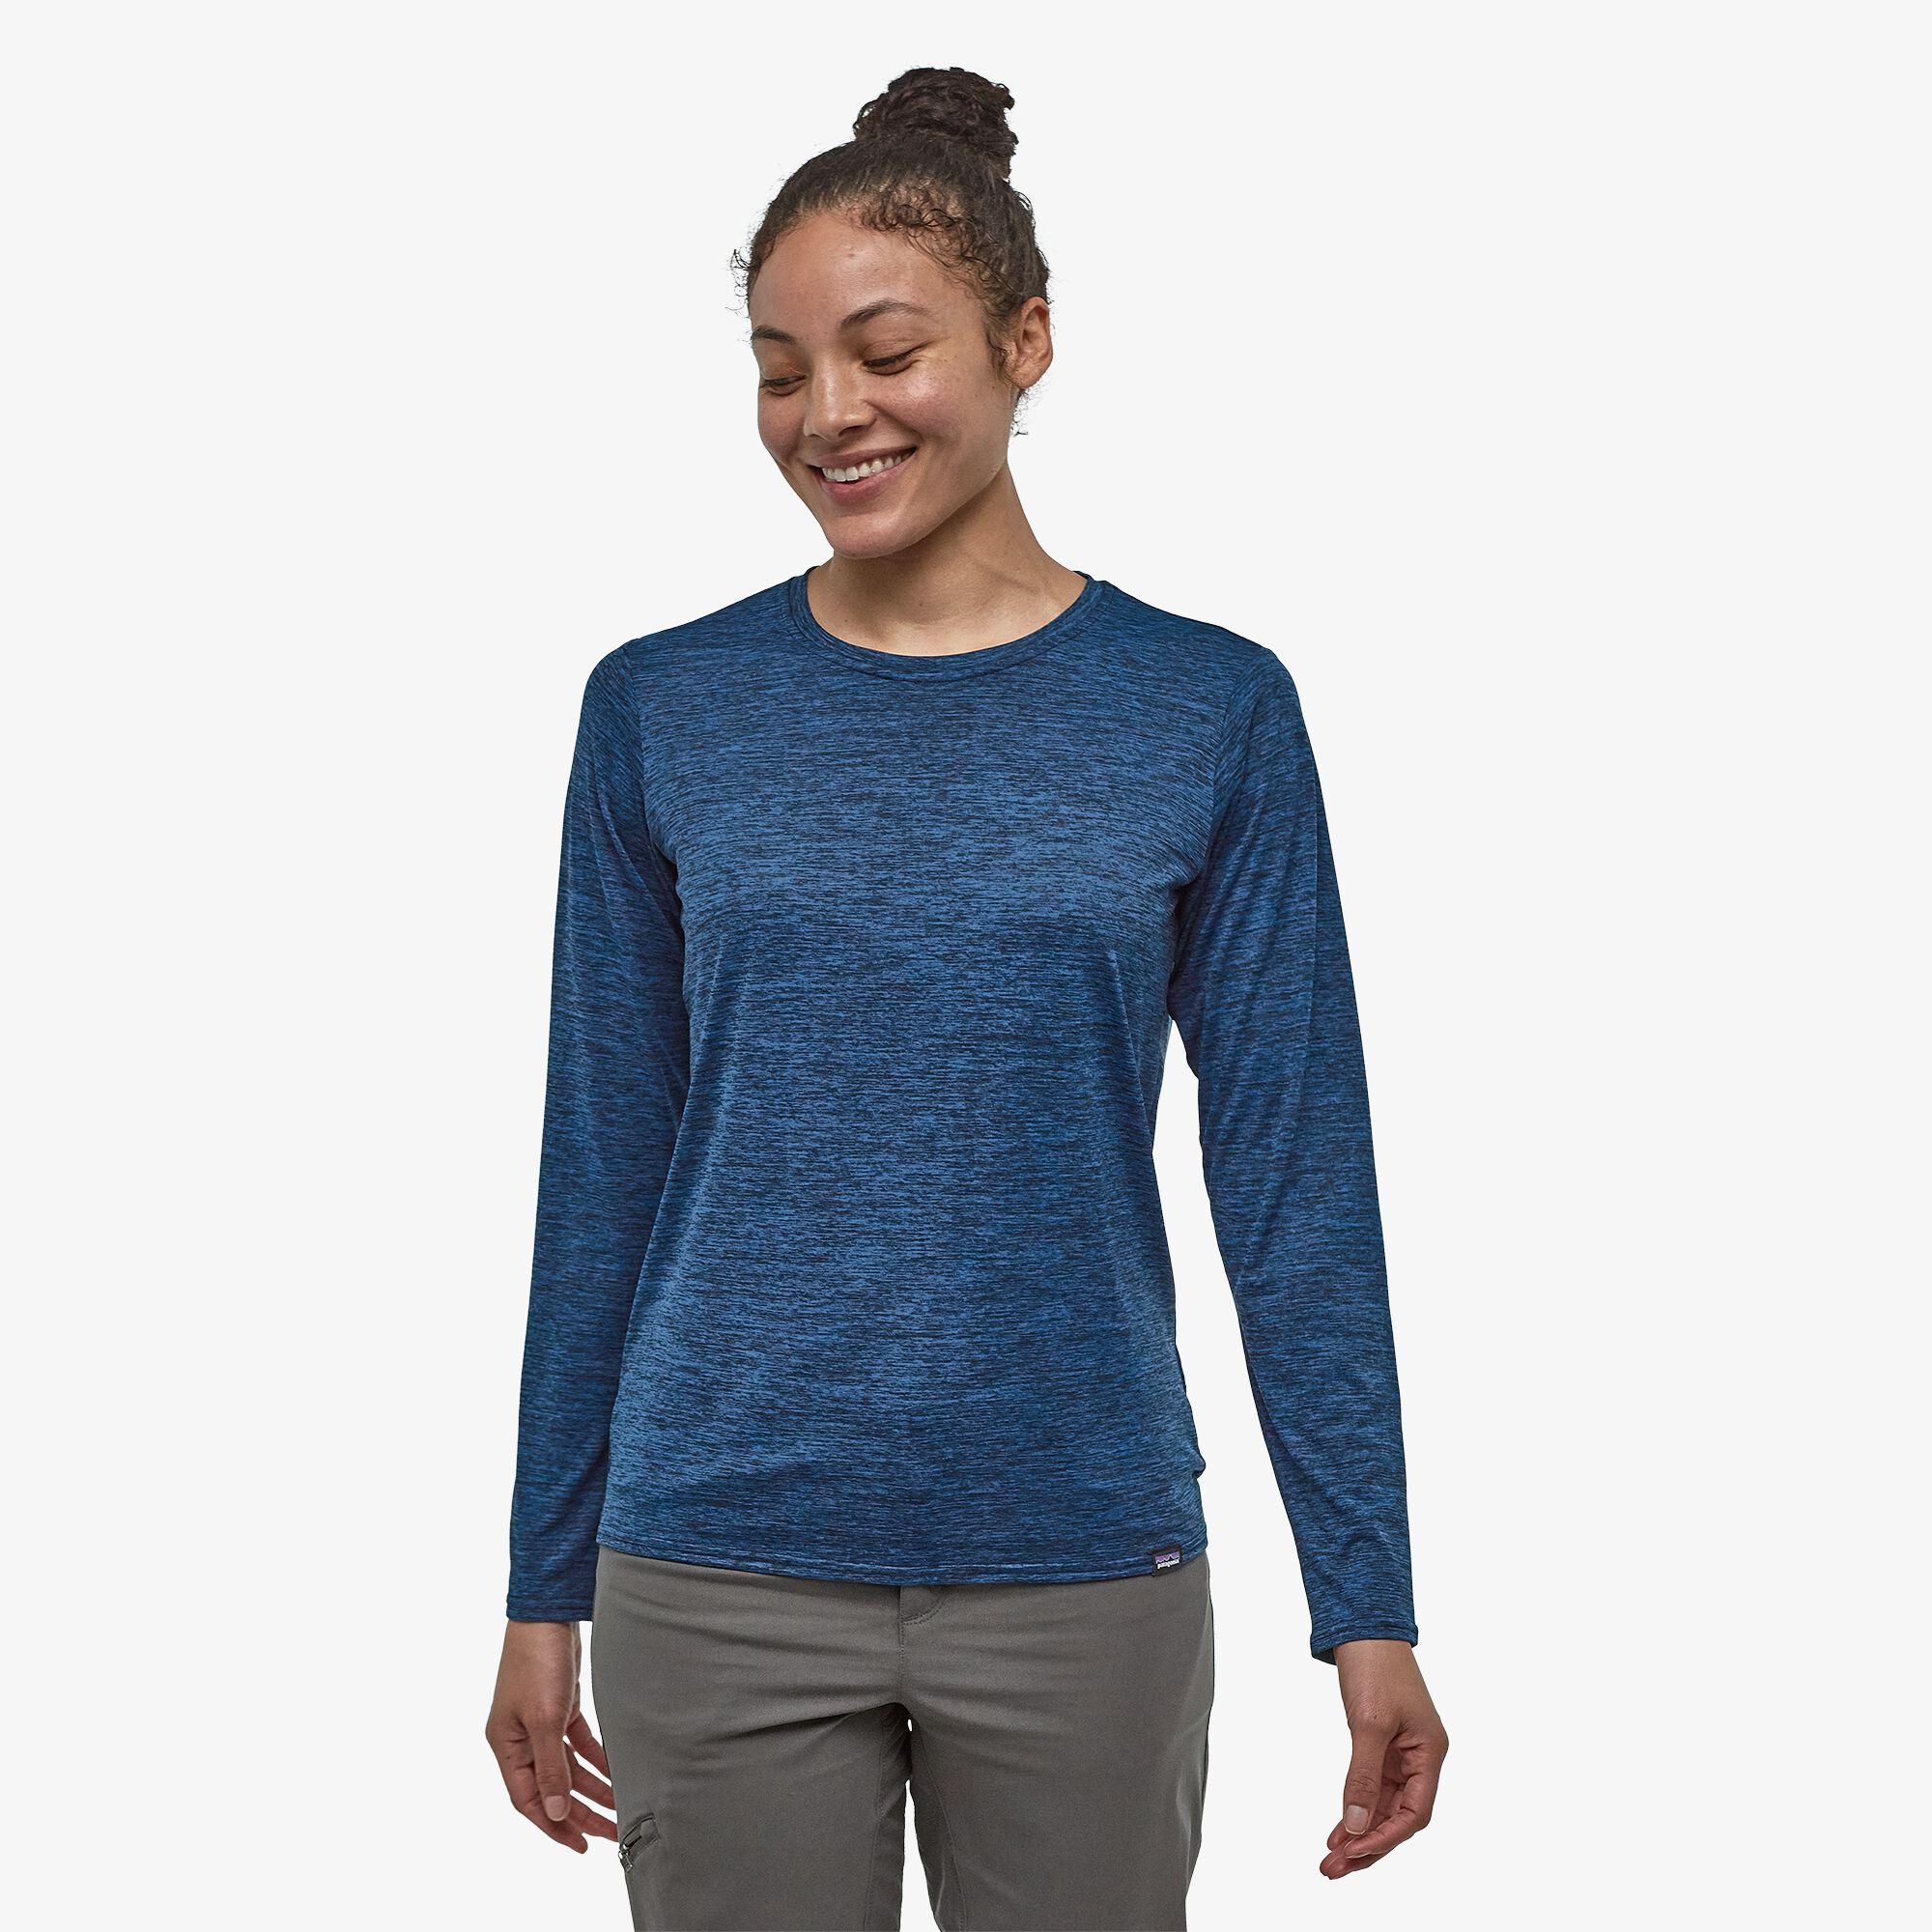 Patagonia_Women's_Long-Sleeved_Capilene_Cool_Daily_Shirt_Model